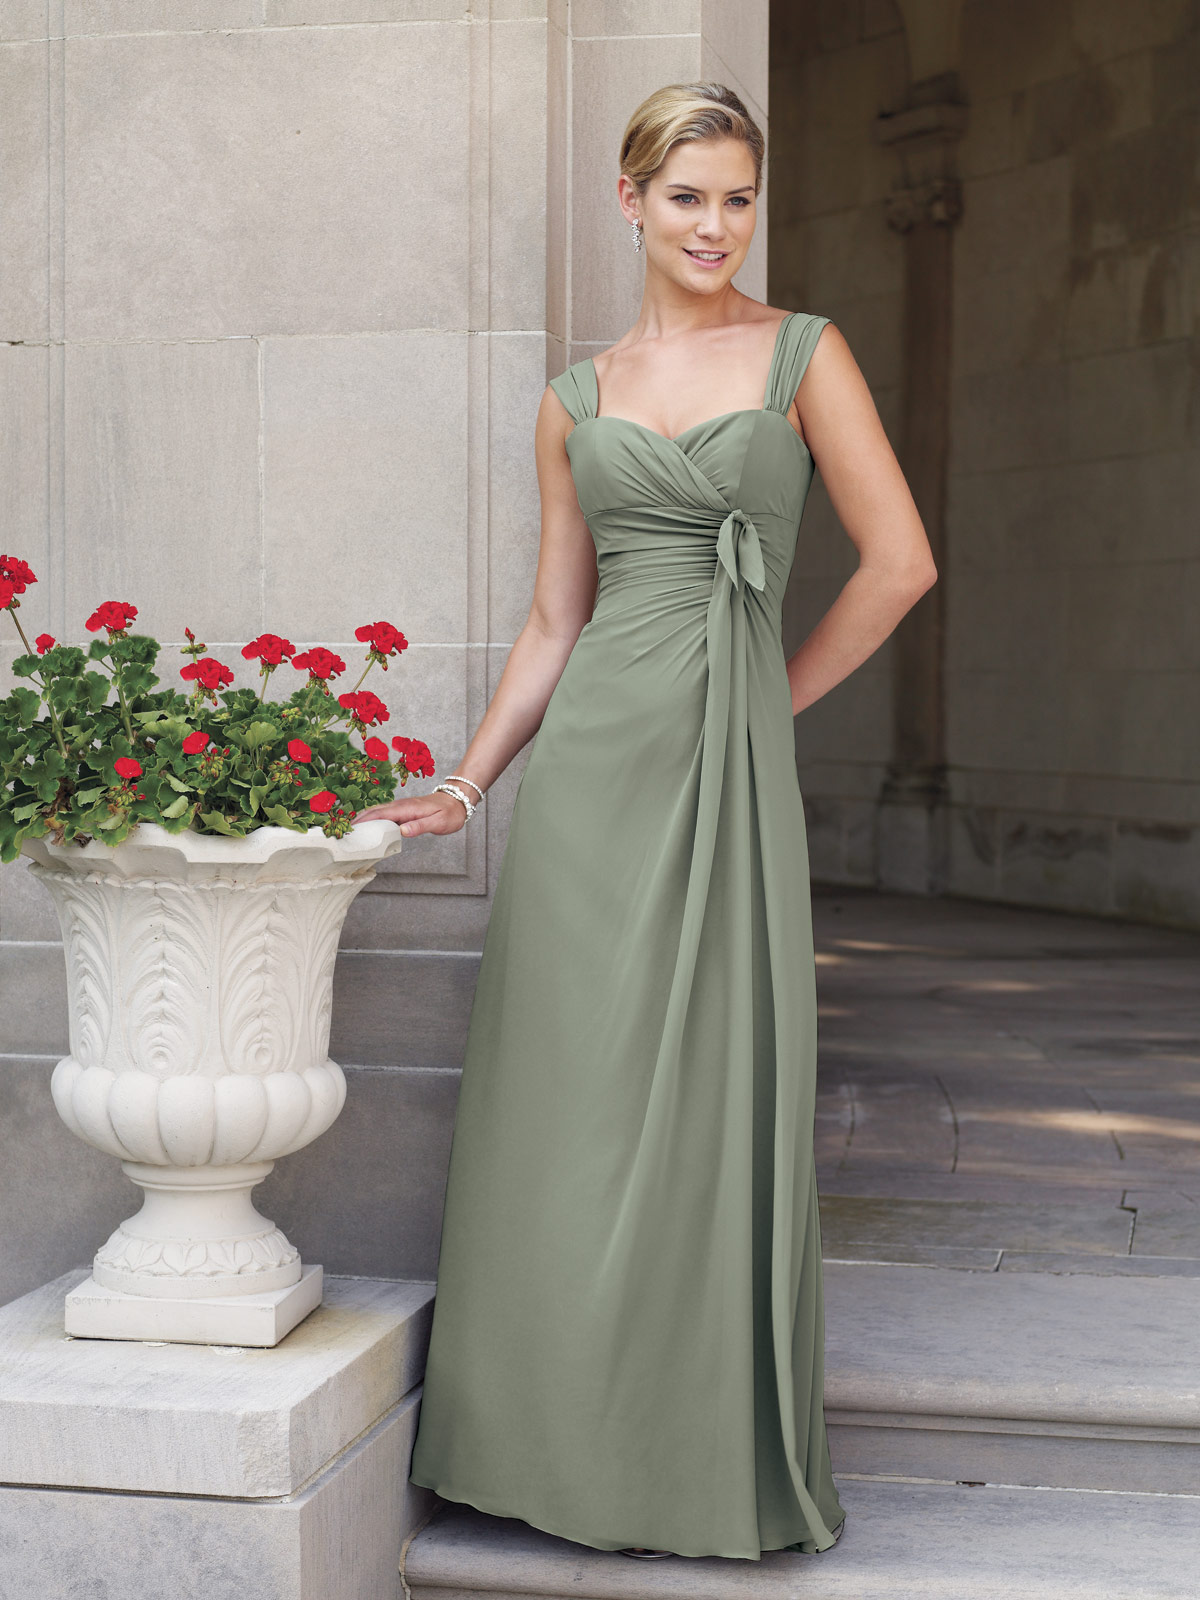 short prom dresses: Sophia Tolli 2012 Bridesmaids Collection